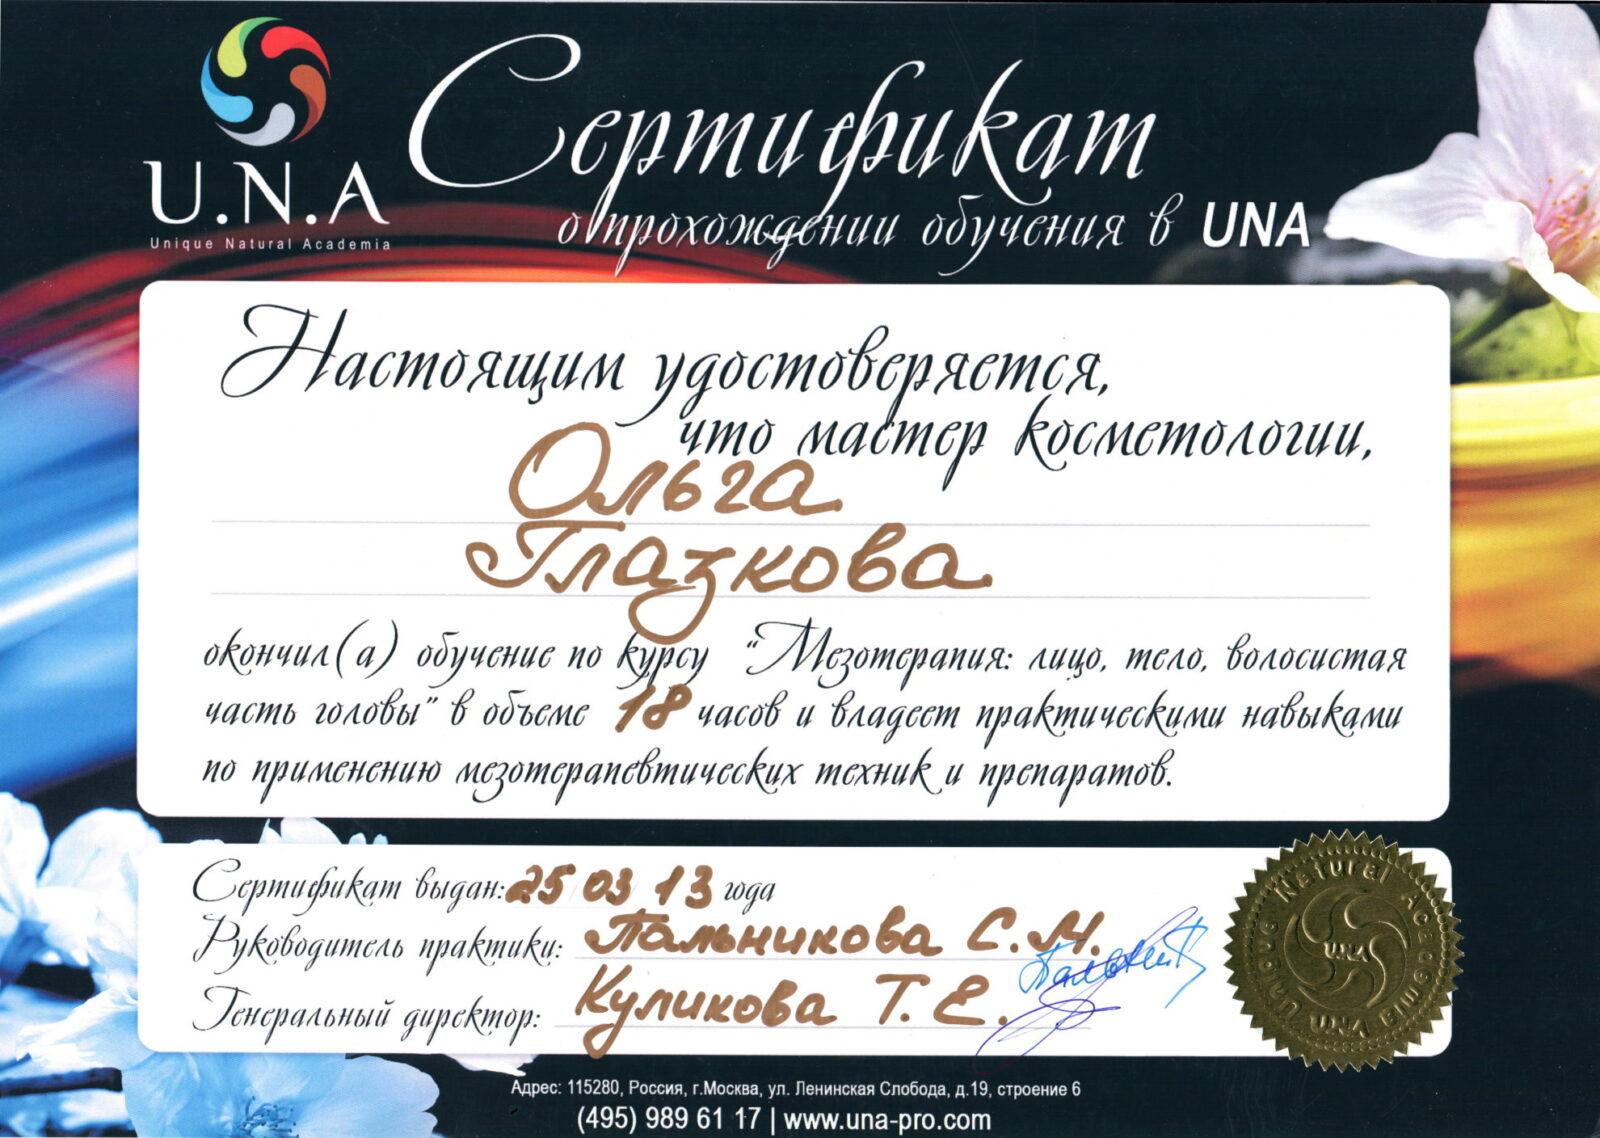 2013.03.13 Сертификат